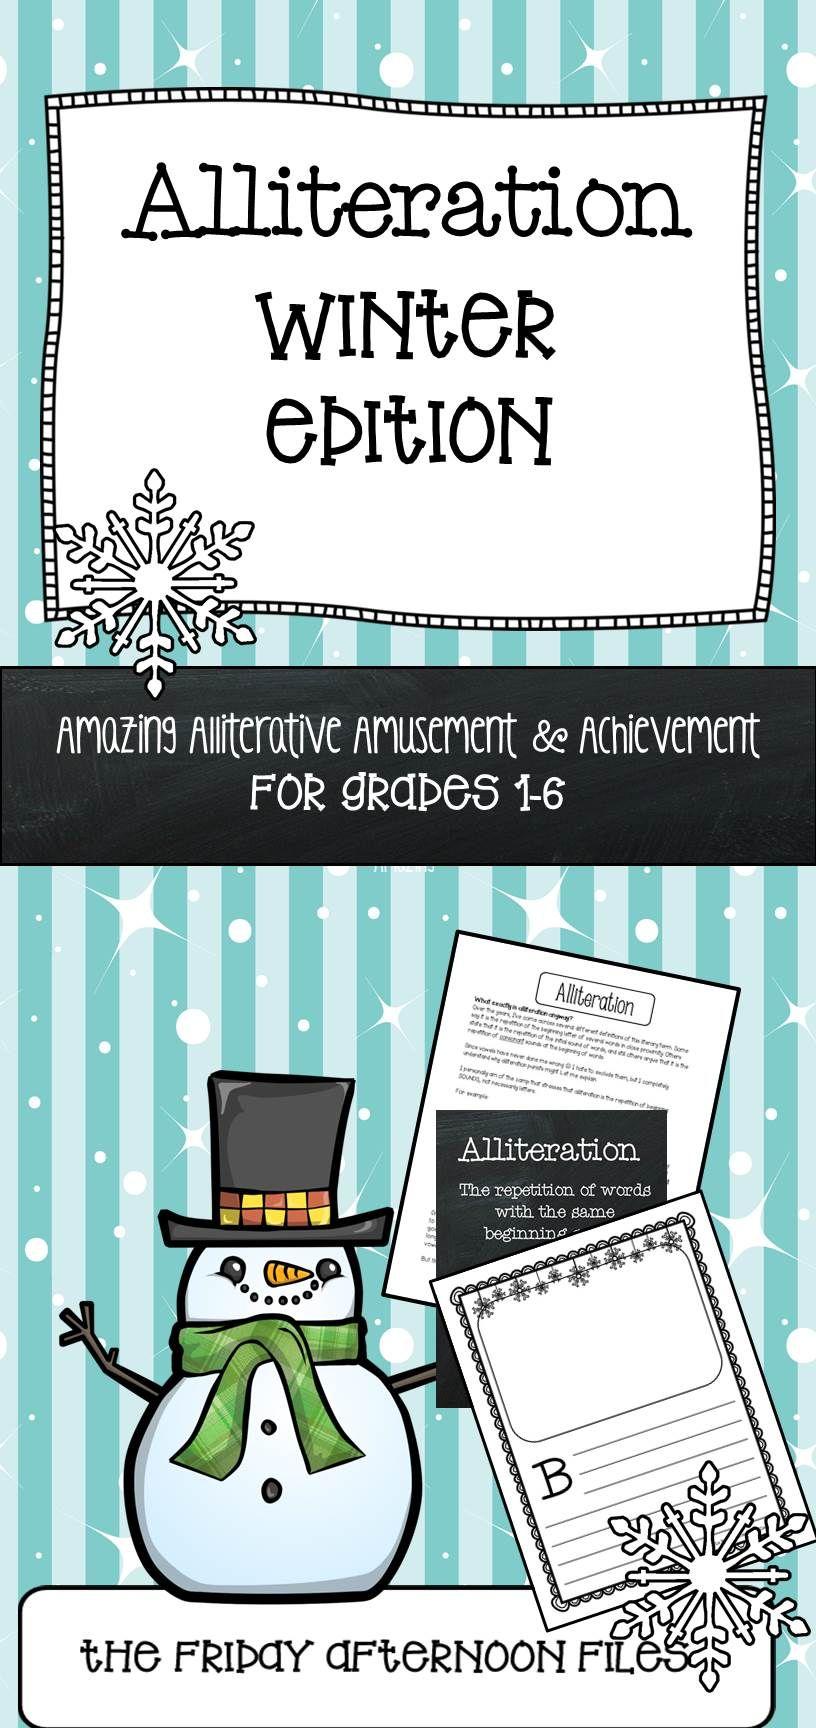 Alliteration: Winter Edition | Alliteration, Winter and Teaching ideas